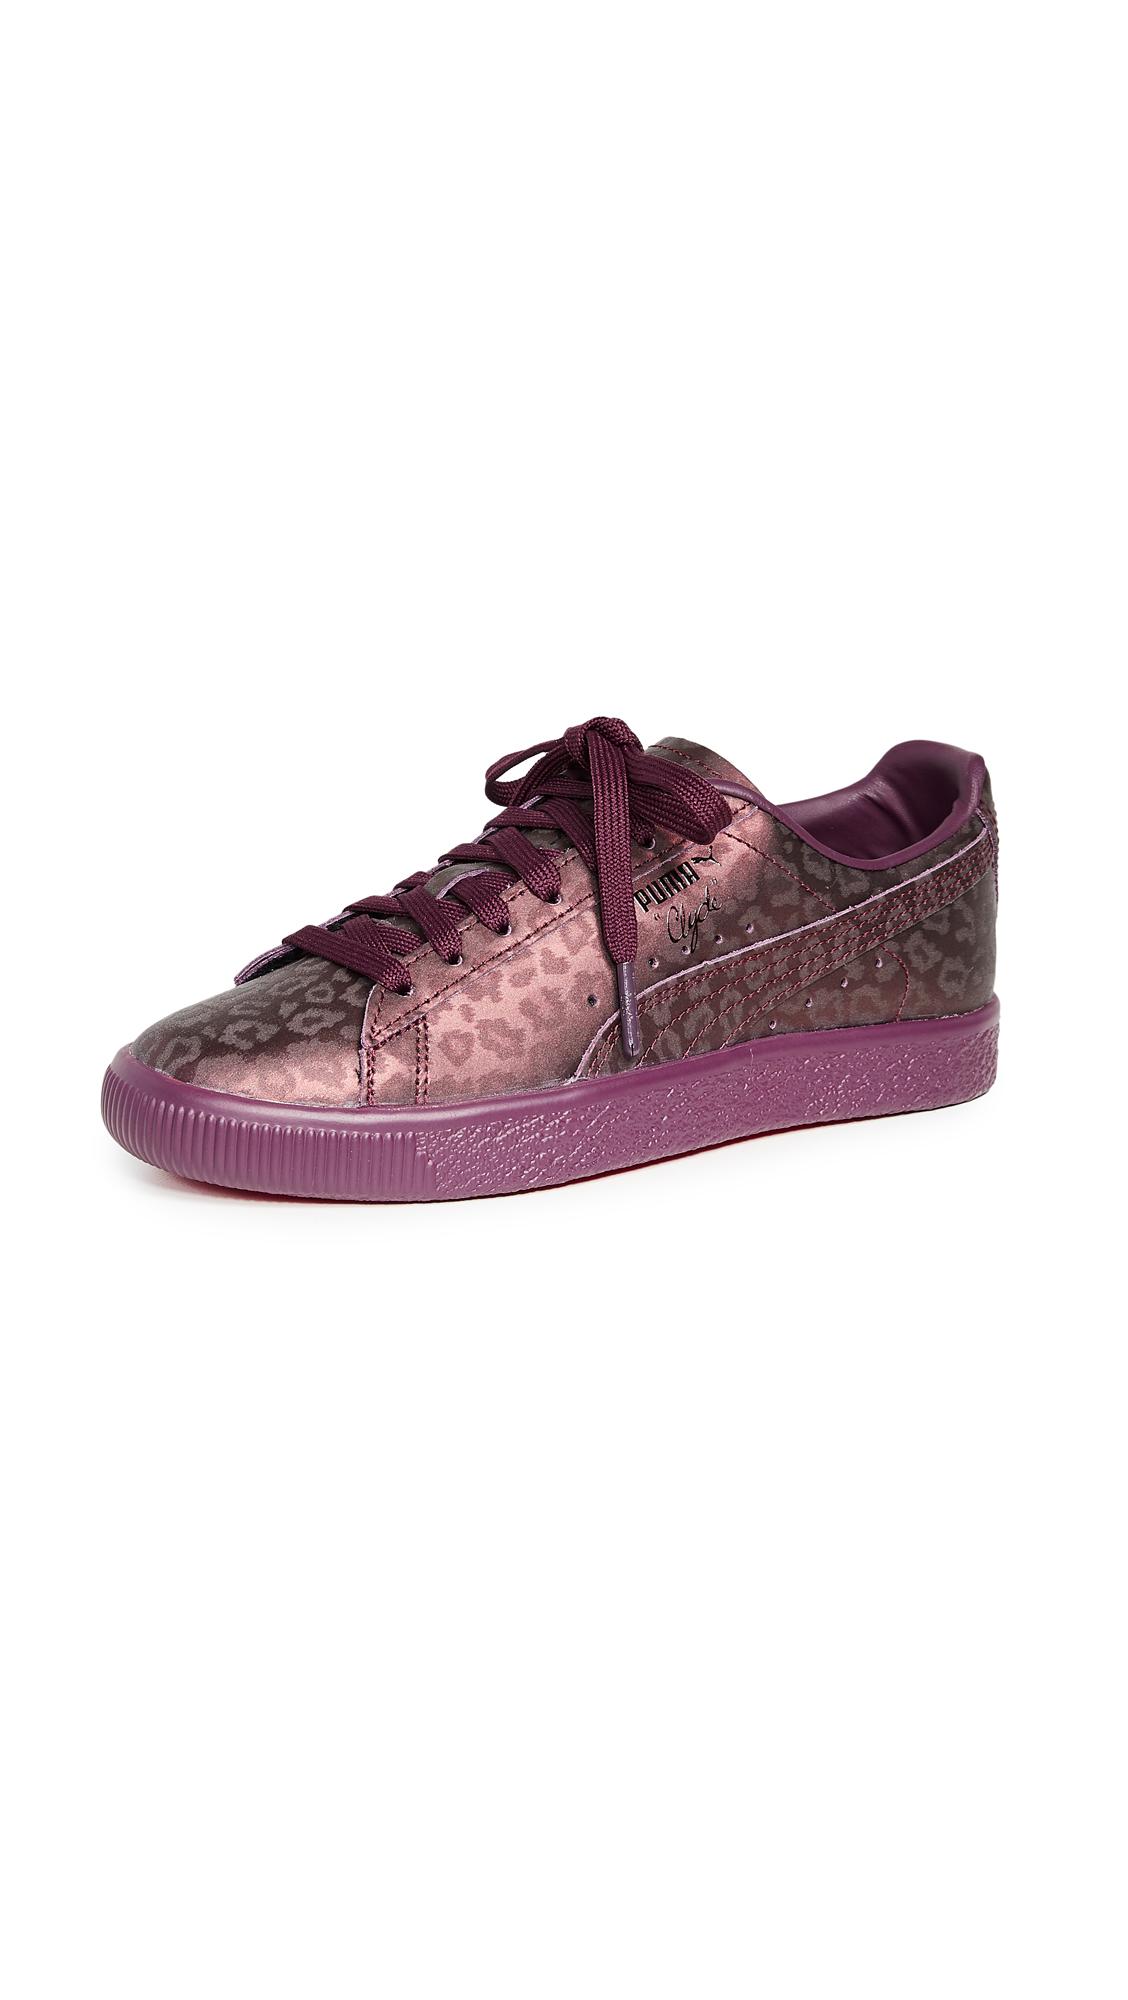 PUMA Clyde Sheer Animal Sneakers